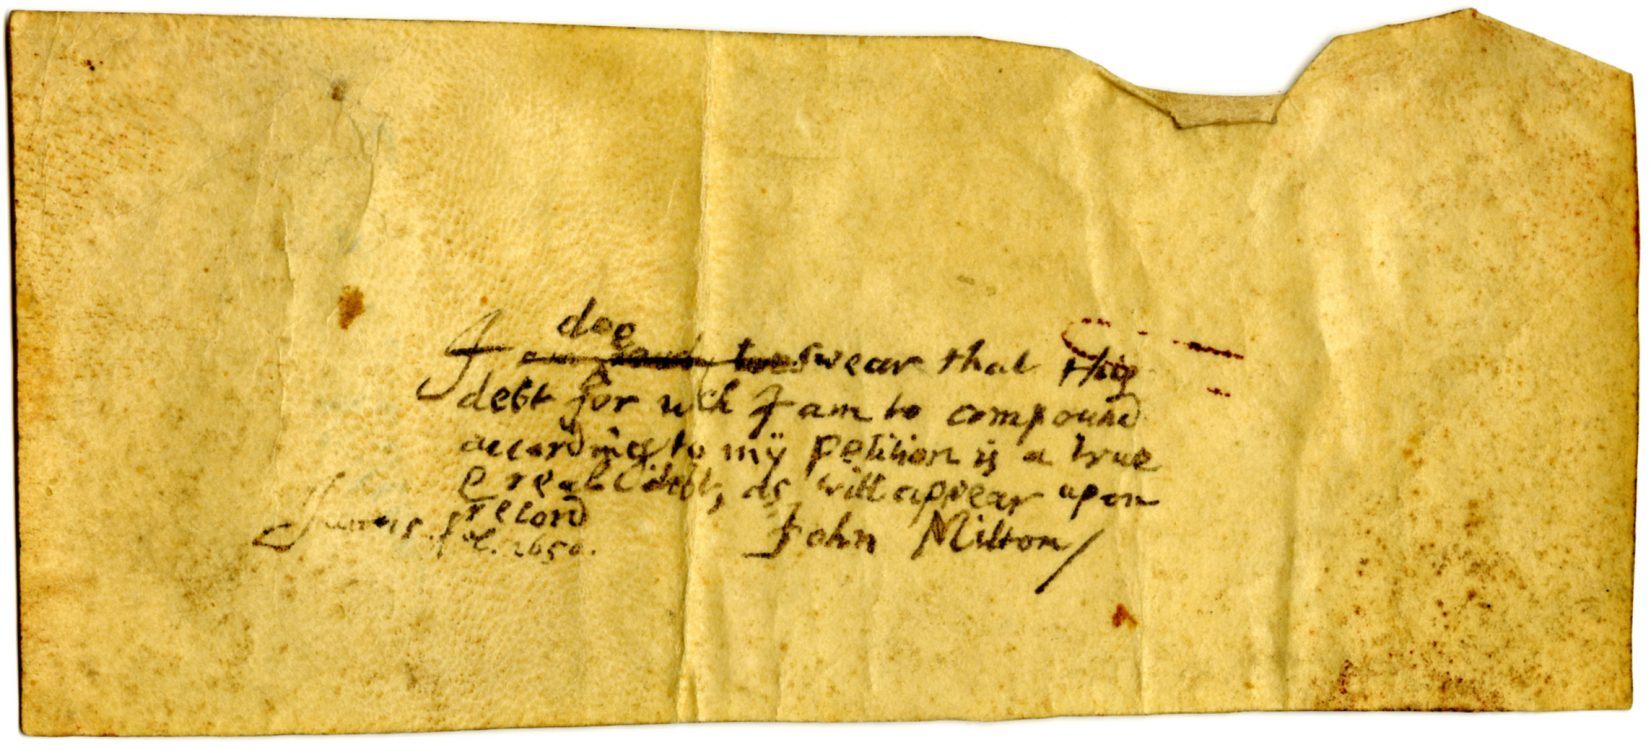 Forged manuscript document on vellum, June 25, 1650